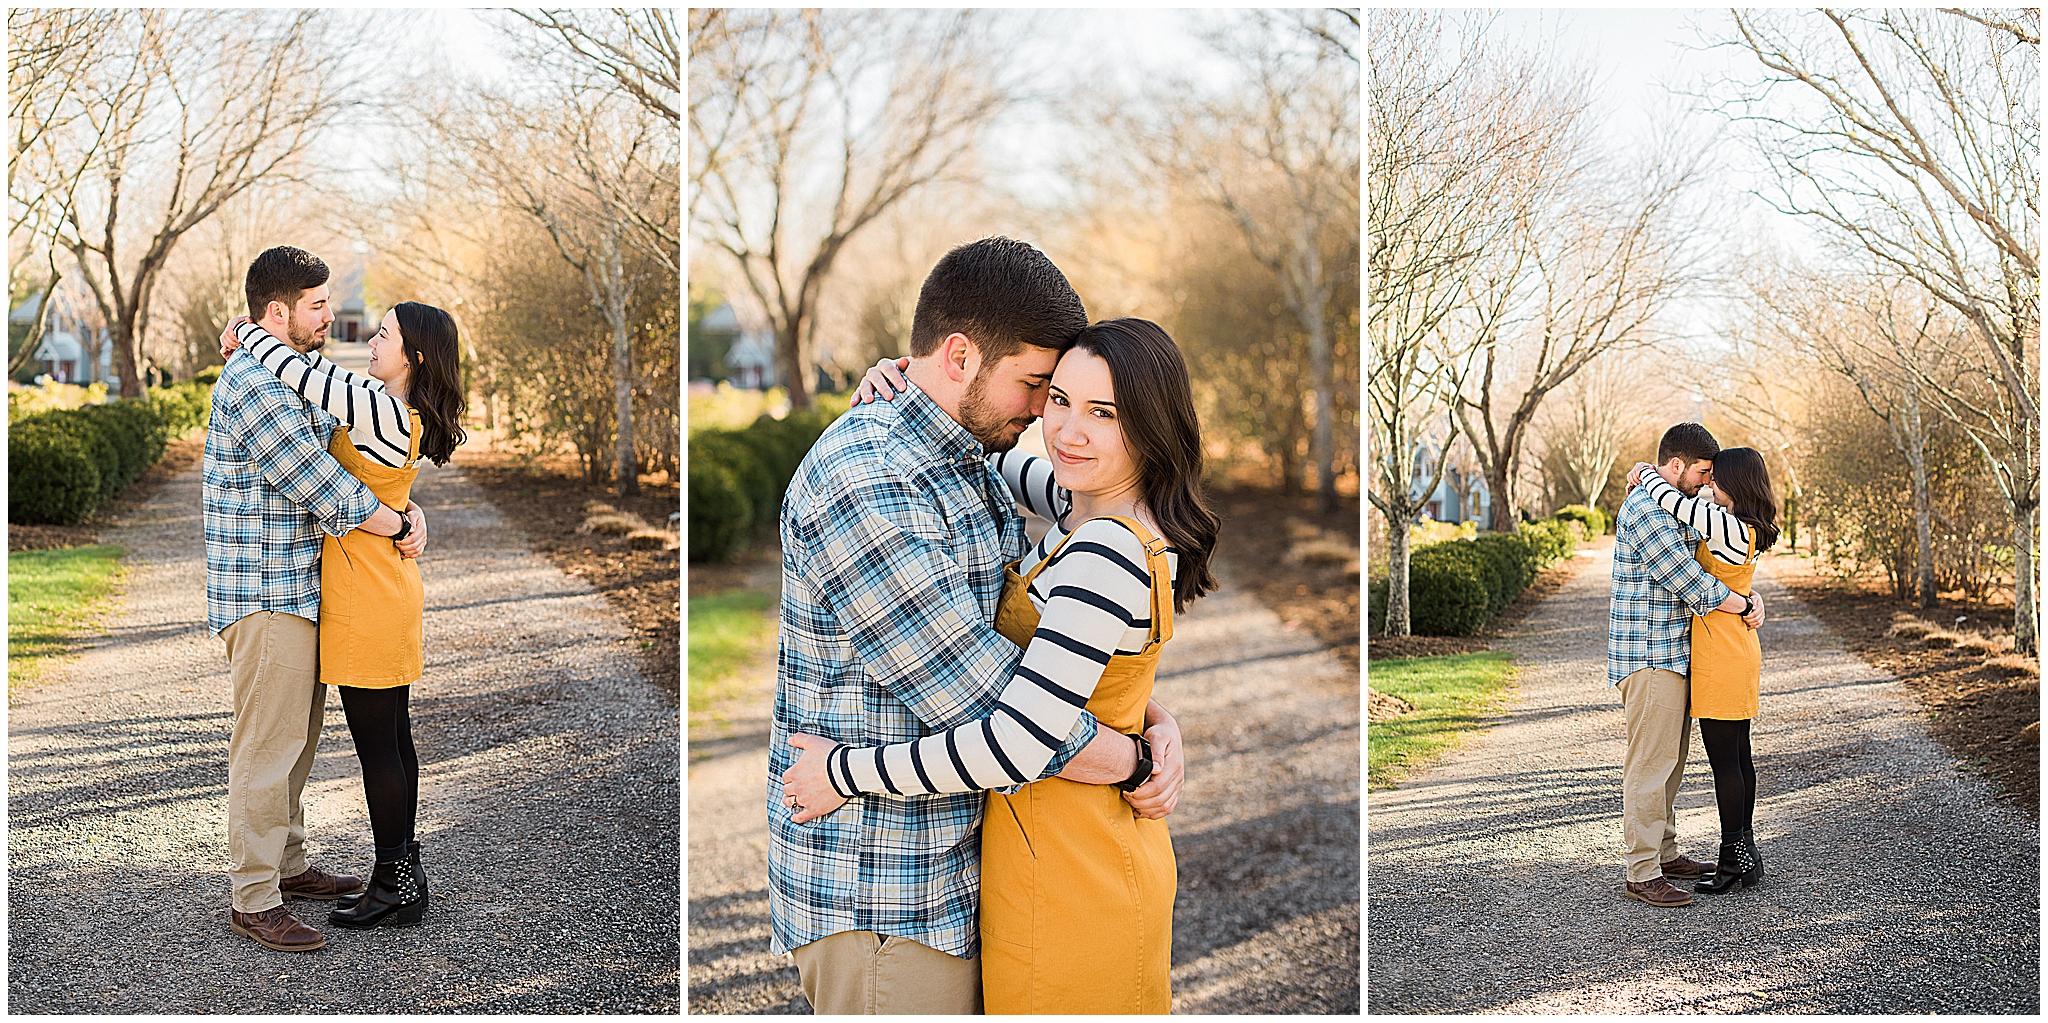 Wedding_Photographer_Asheville_engagement_Arboretum_0008.jpg